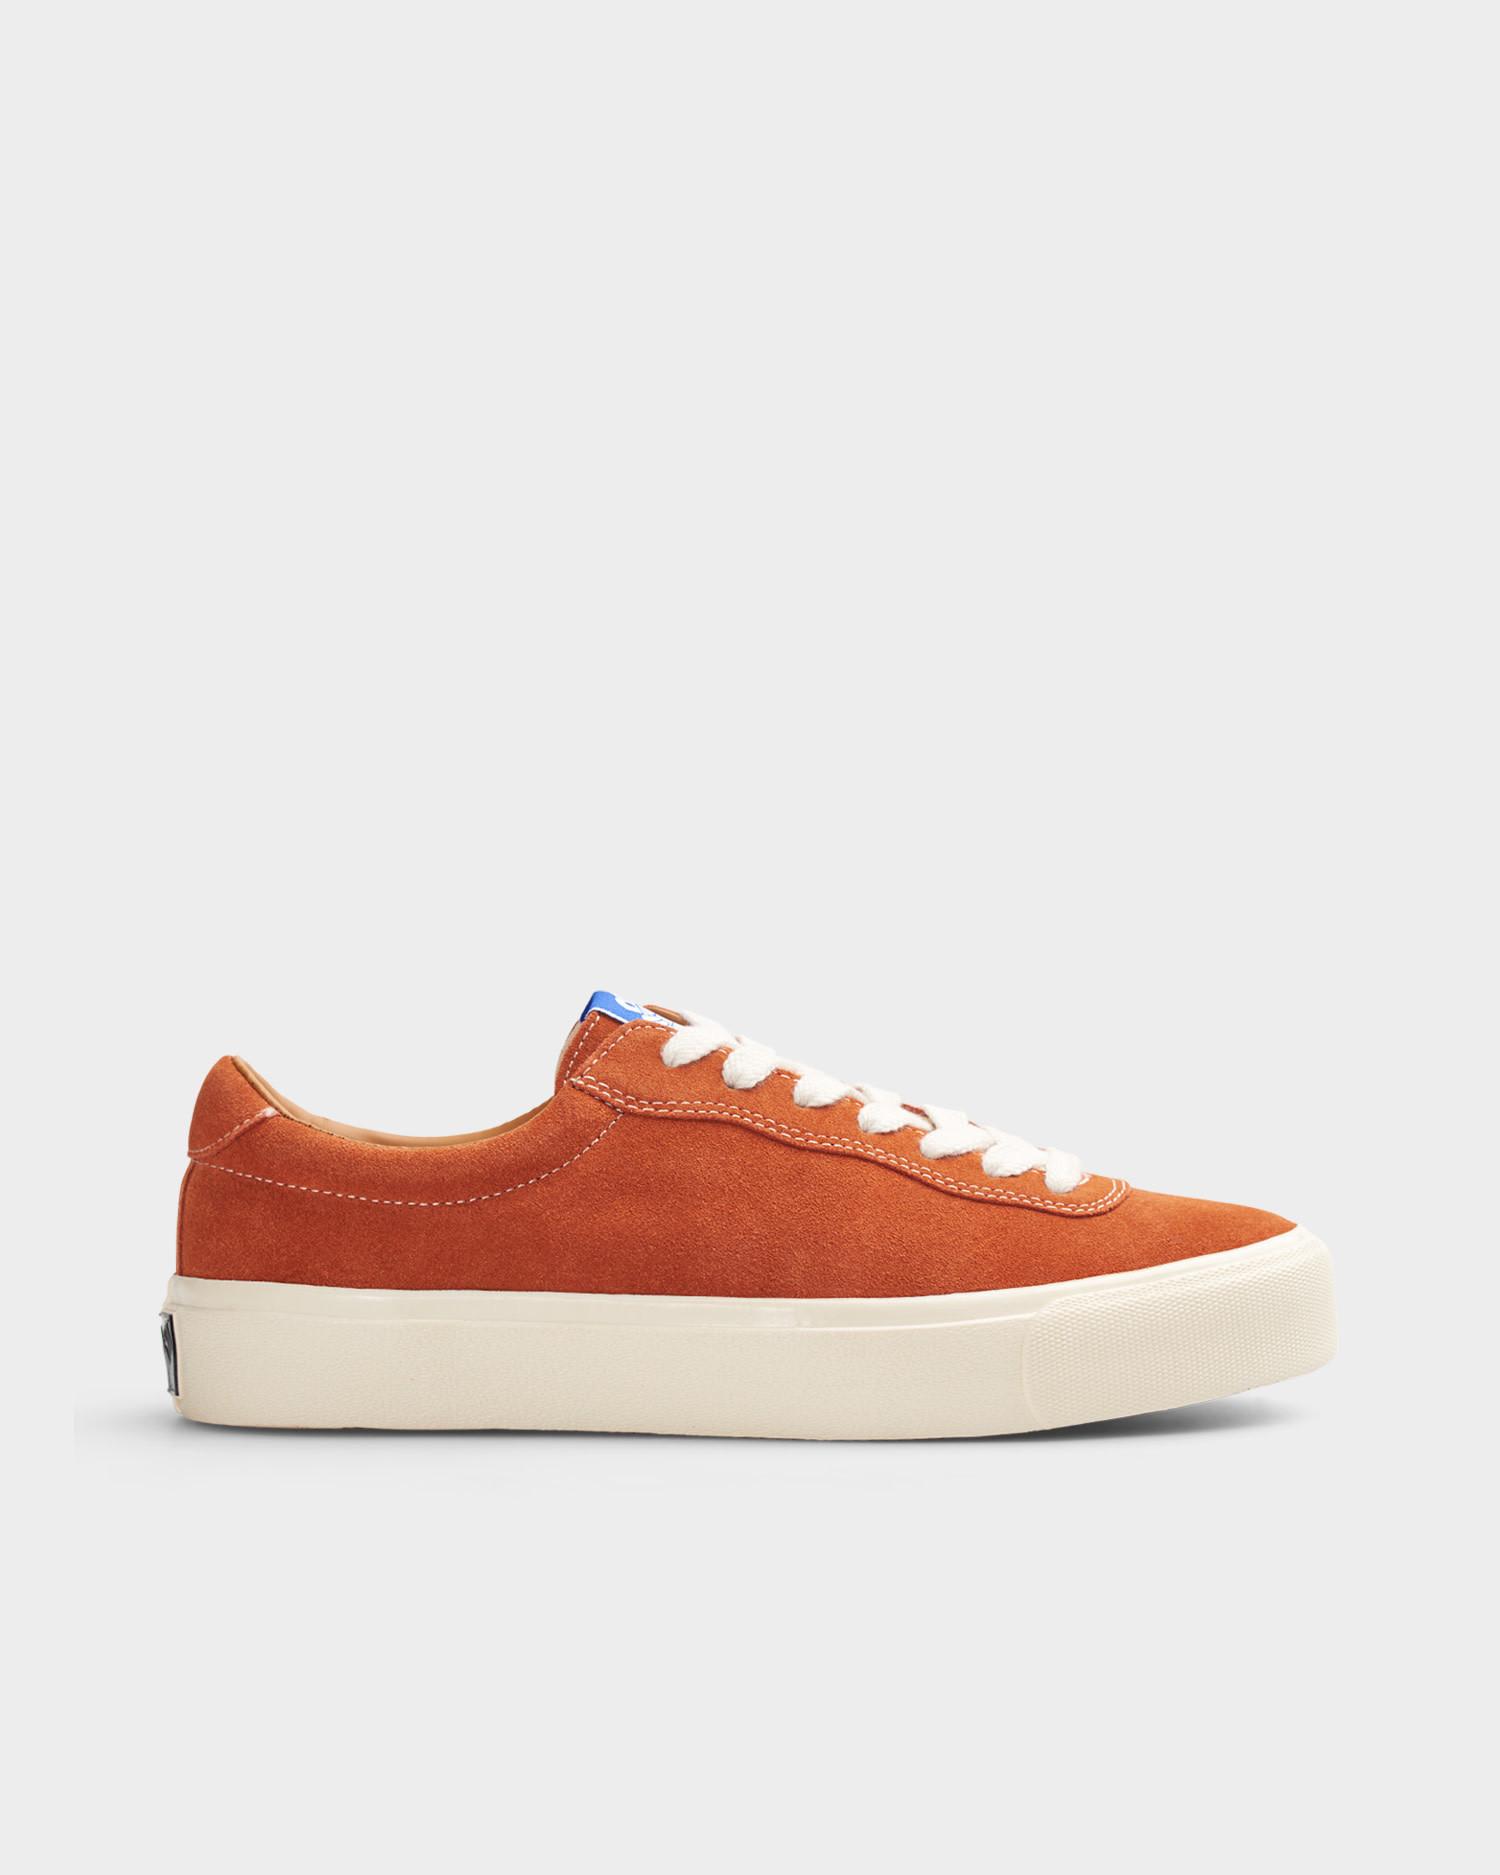 Last Resort VM001 Suede Low Burnt Orange/White